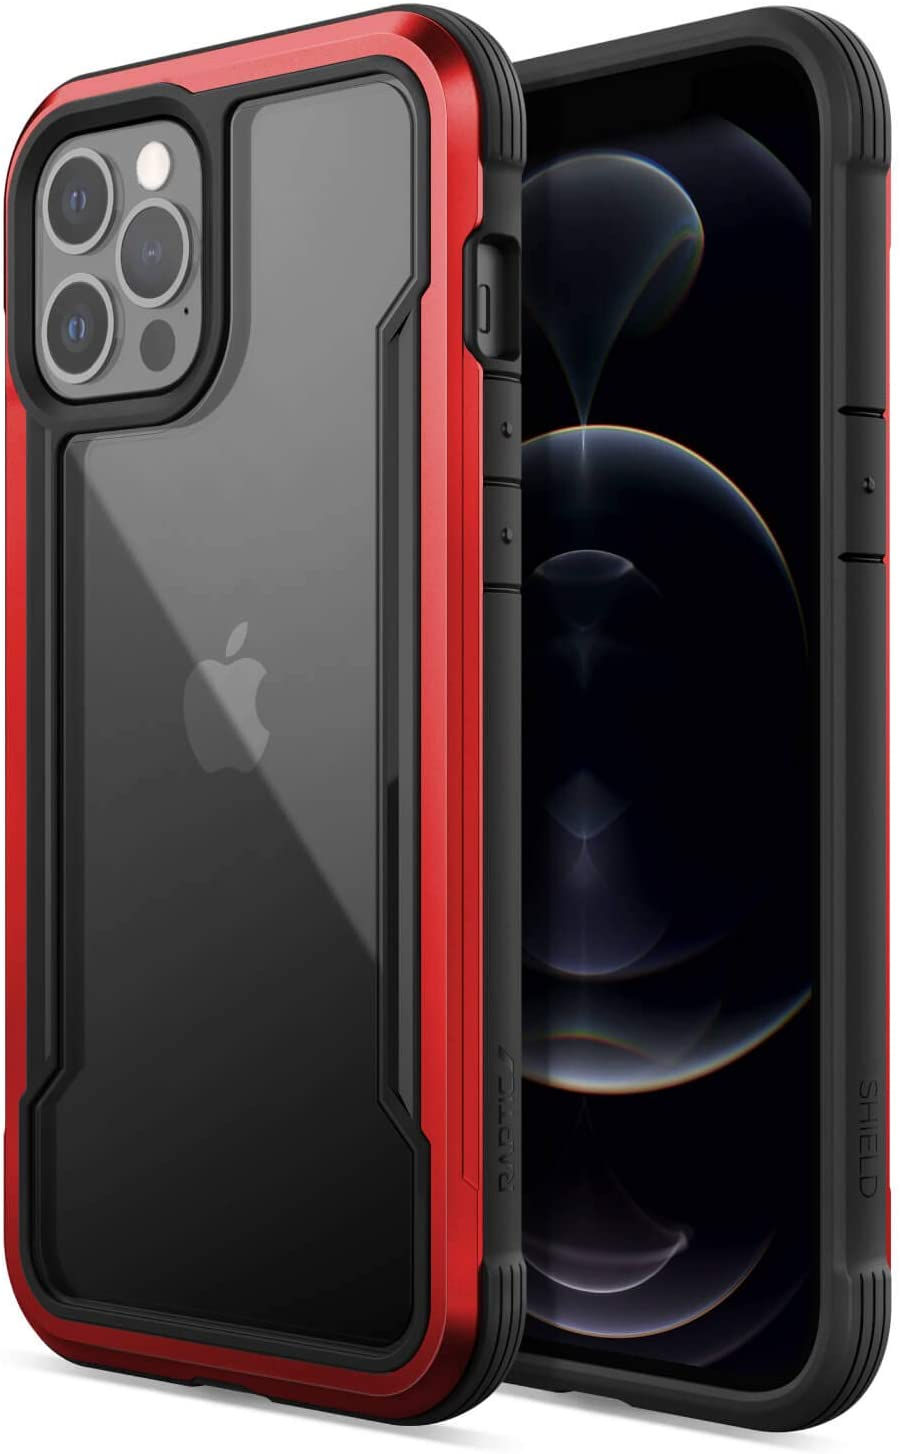 Raptic Shield Etui Aluminiowe do iPhone 12 Pro Max (Drop Test 3m) (Red)